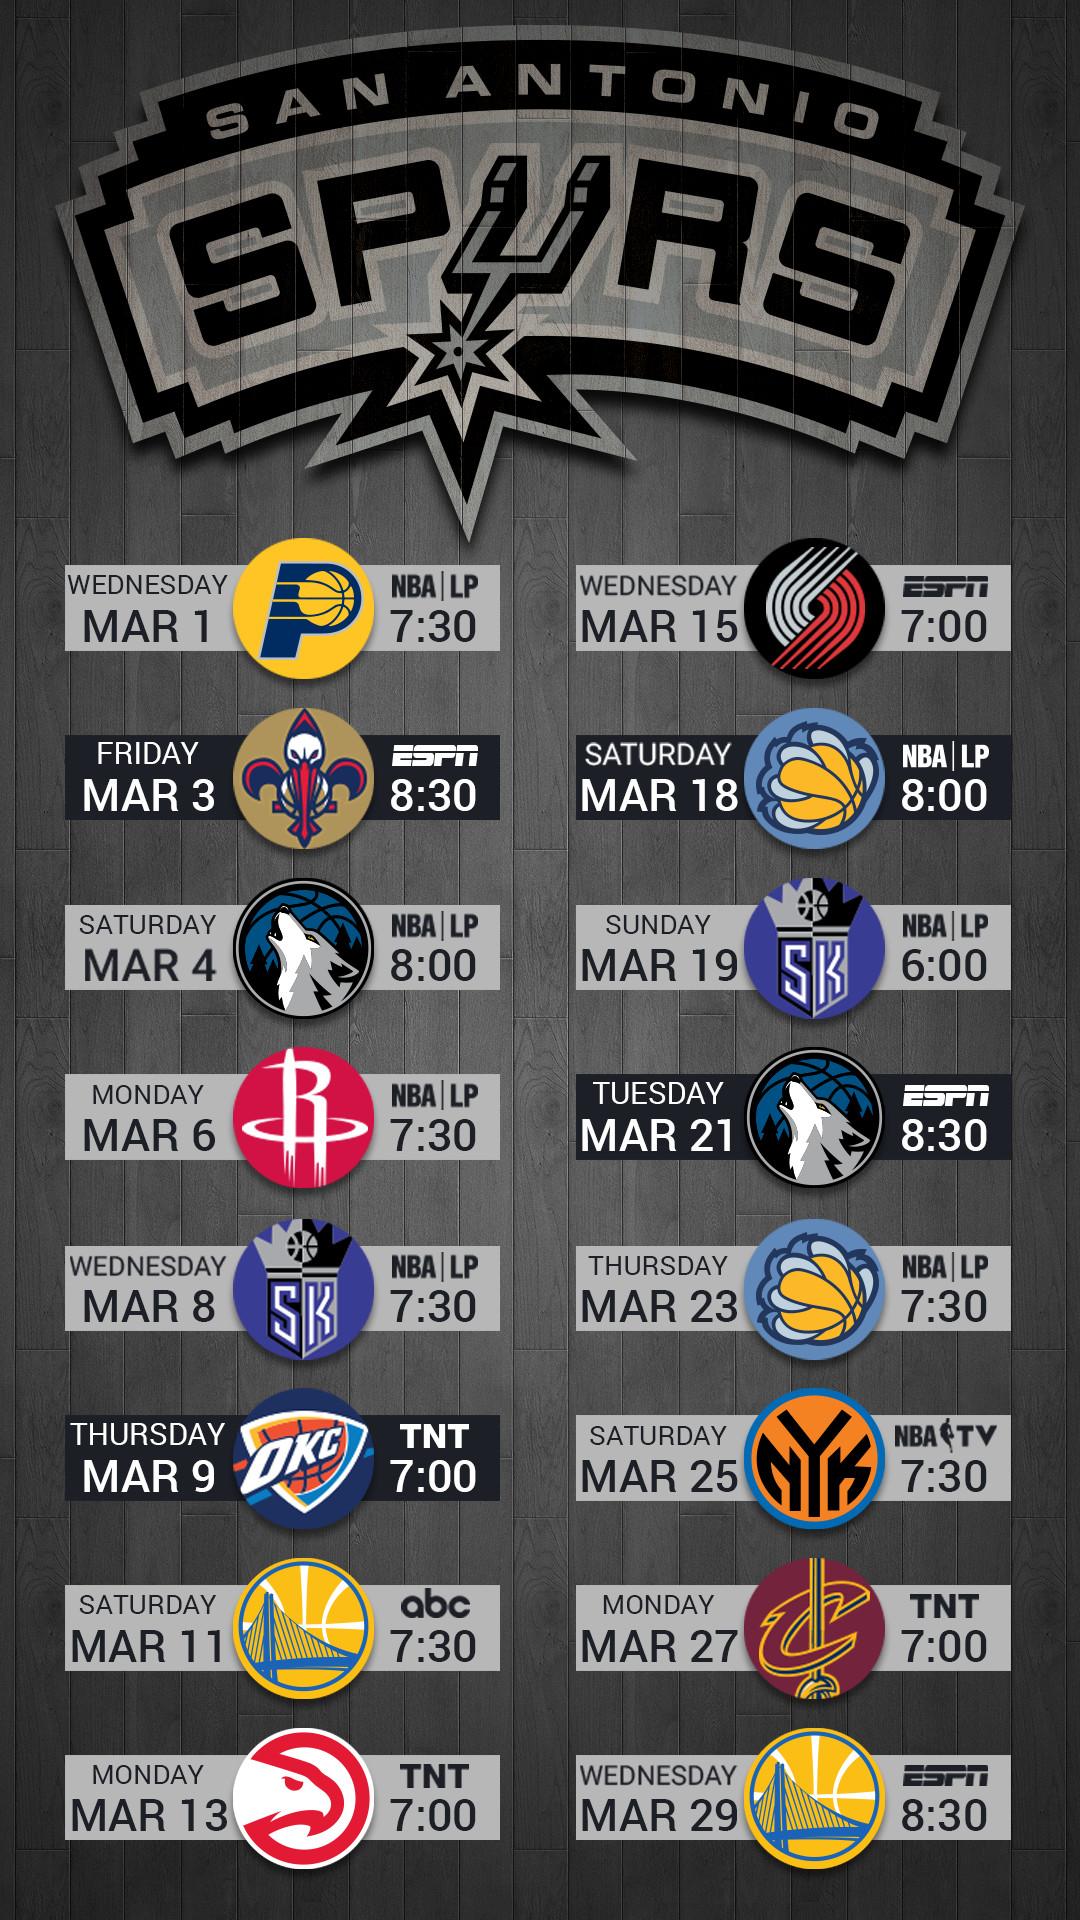 San Antonio Spurs 2017 Mobile lock screen wallpaper for iPhone, Android,  Pixel